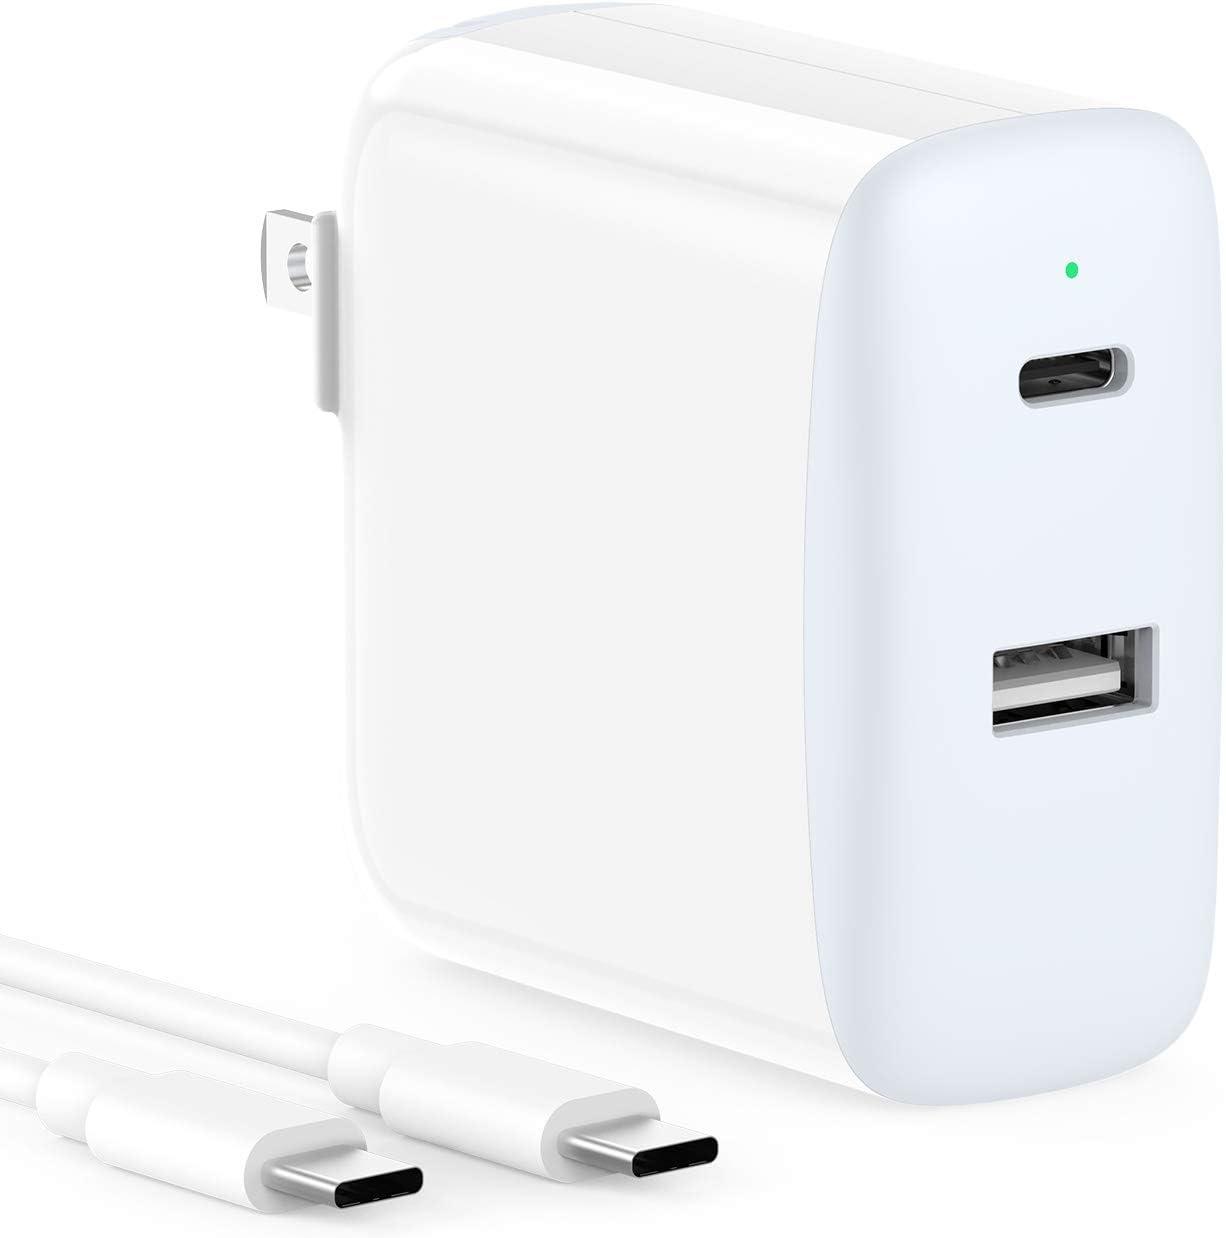 30W 2 Port with 18W USB C Fast Charger Compatible for iPad Pro 12.9 Gen 4/3 2020/2018, Pro 11 Gen 2/1, Air 4, Pixel 4/3, Pixel 2 XL Pixel 3A XL 2XL 3XL 4XL, Foldable Plug, LED, 6.6ft USB C to C Cord